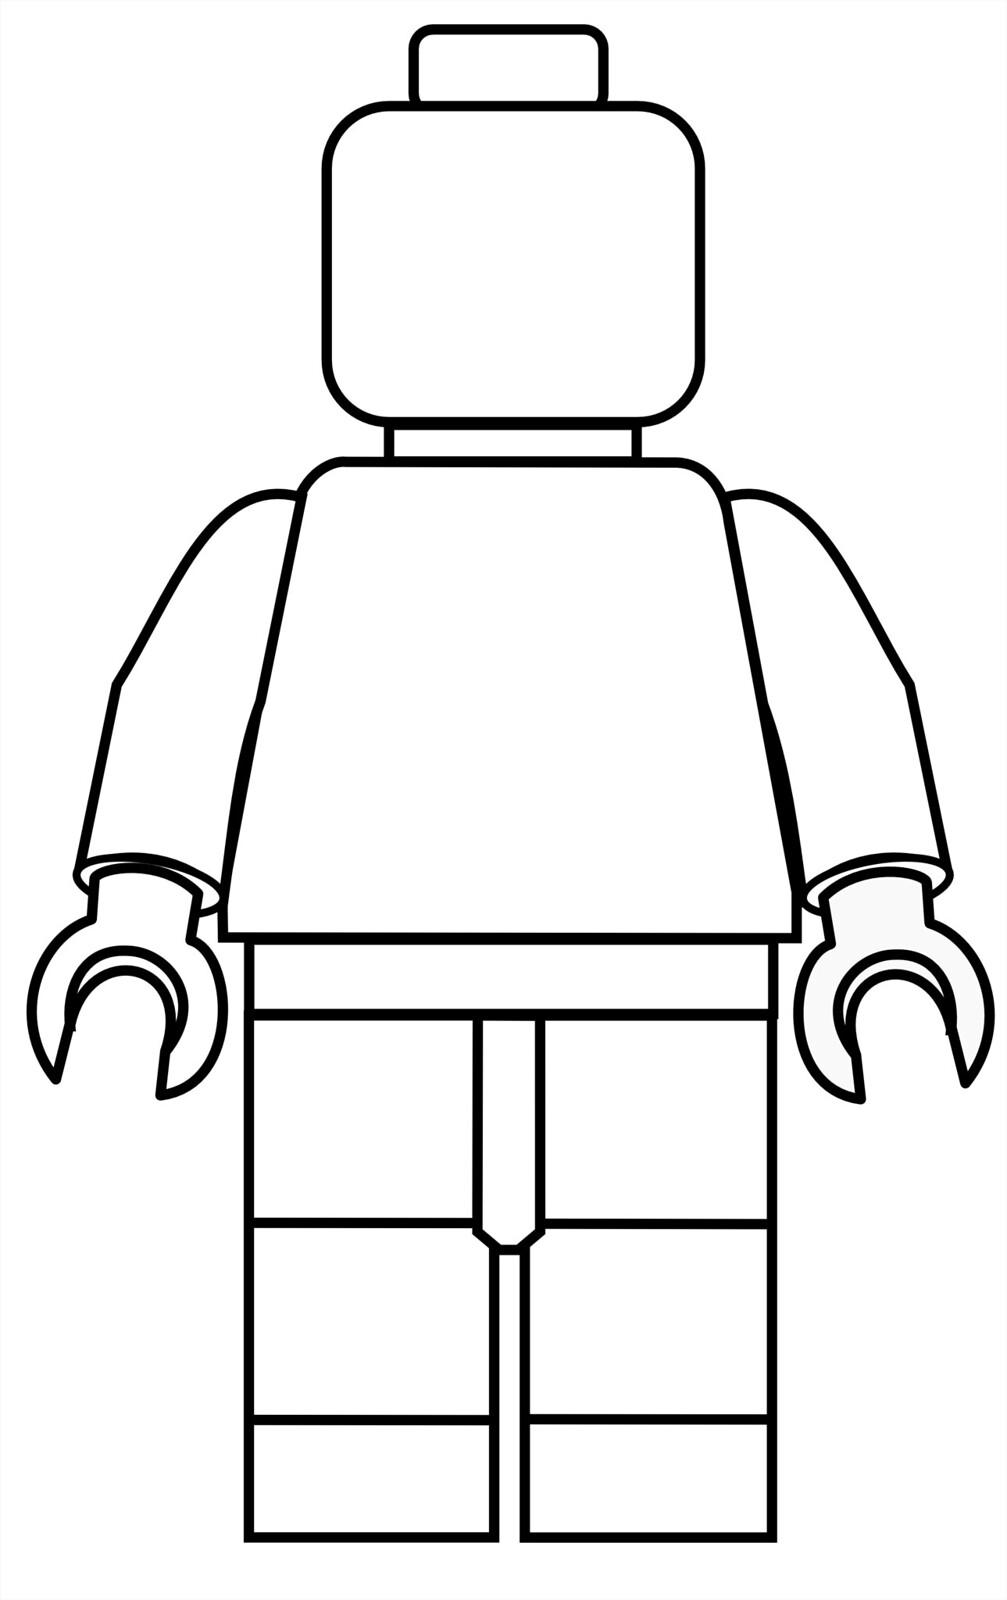 Image of a blank LEGO minifigure